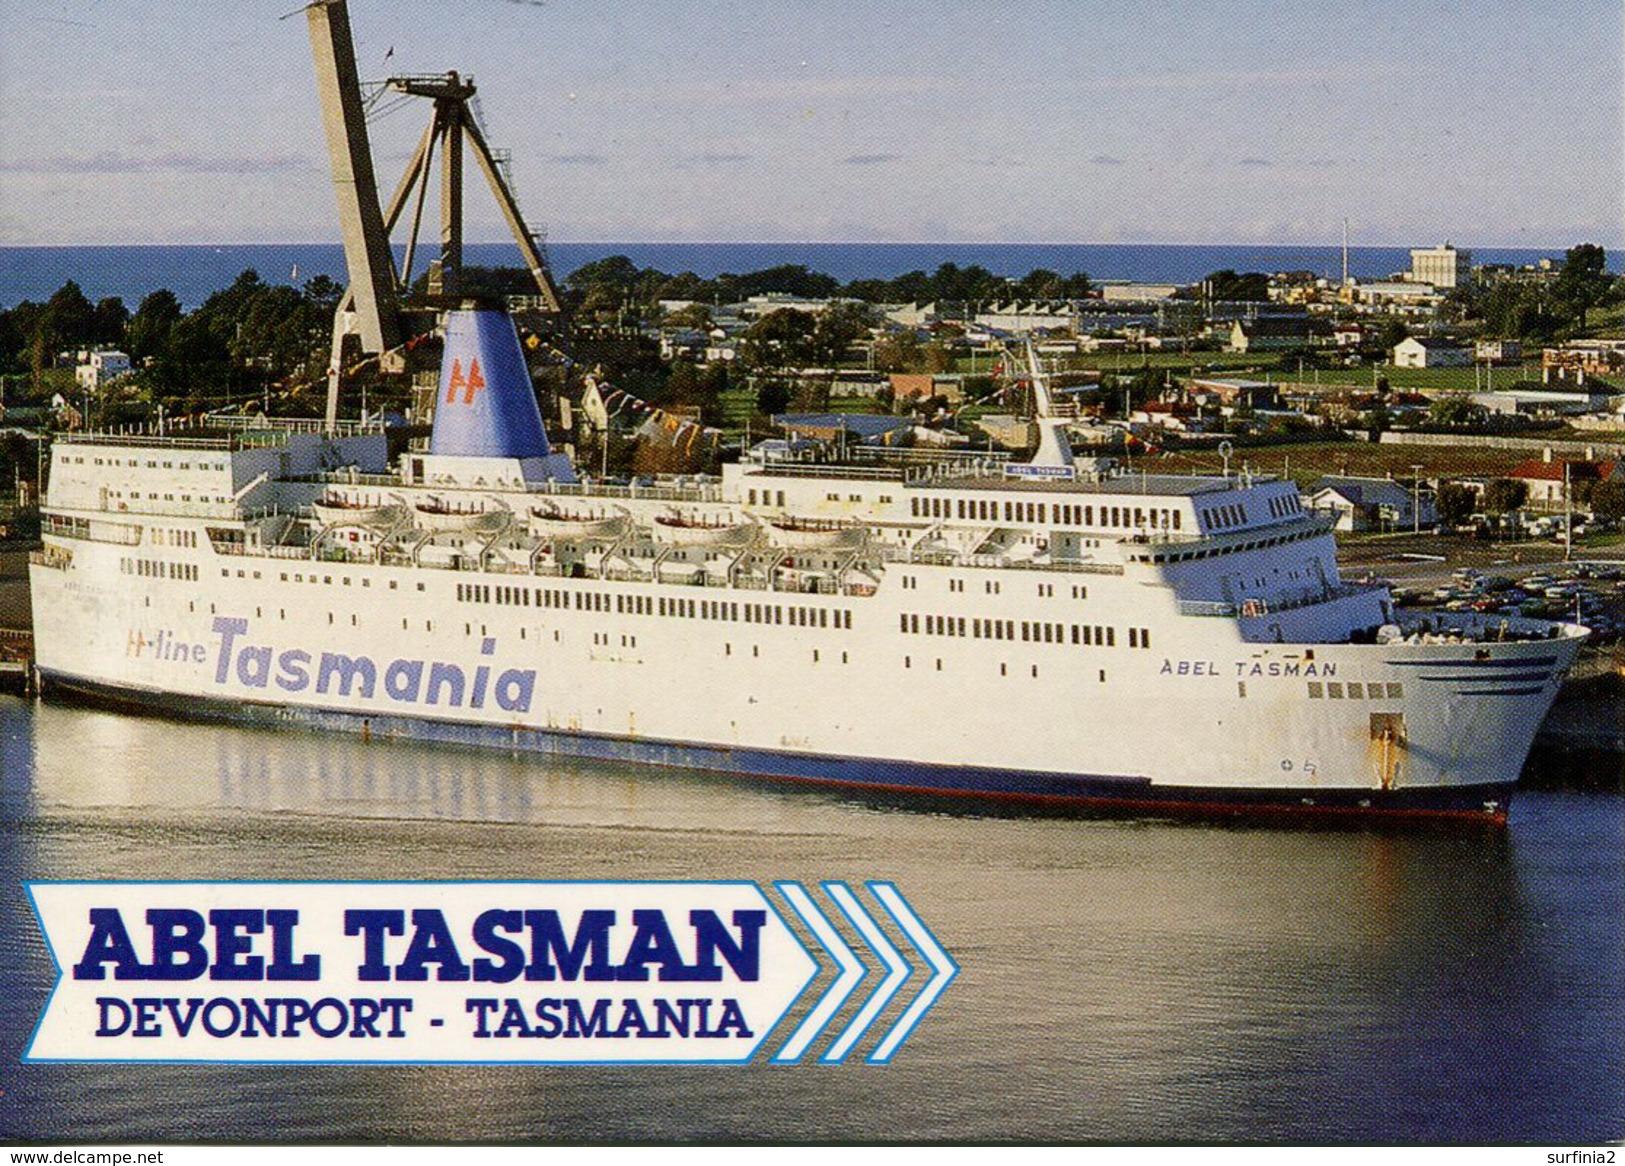 "SHIPPING - ""ABEL TASMAN"" At DEVONPORT, TASMANIA Ship109 - Steamers"